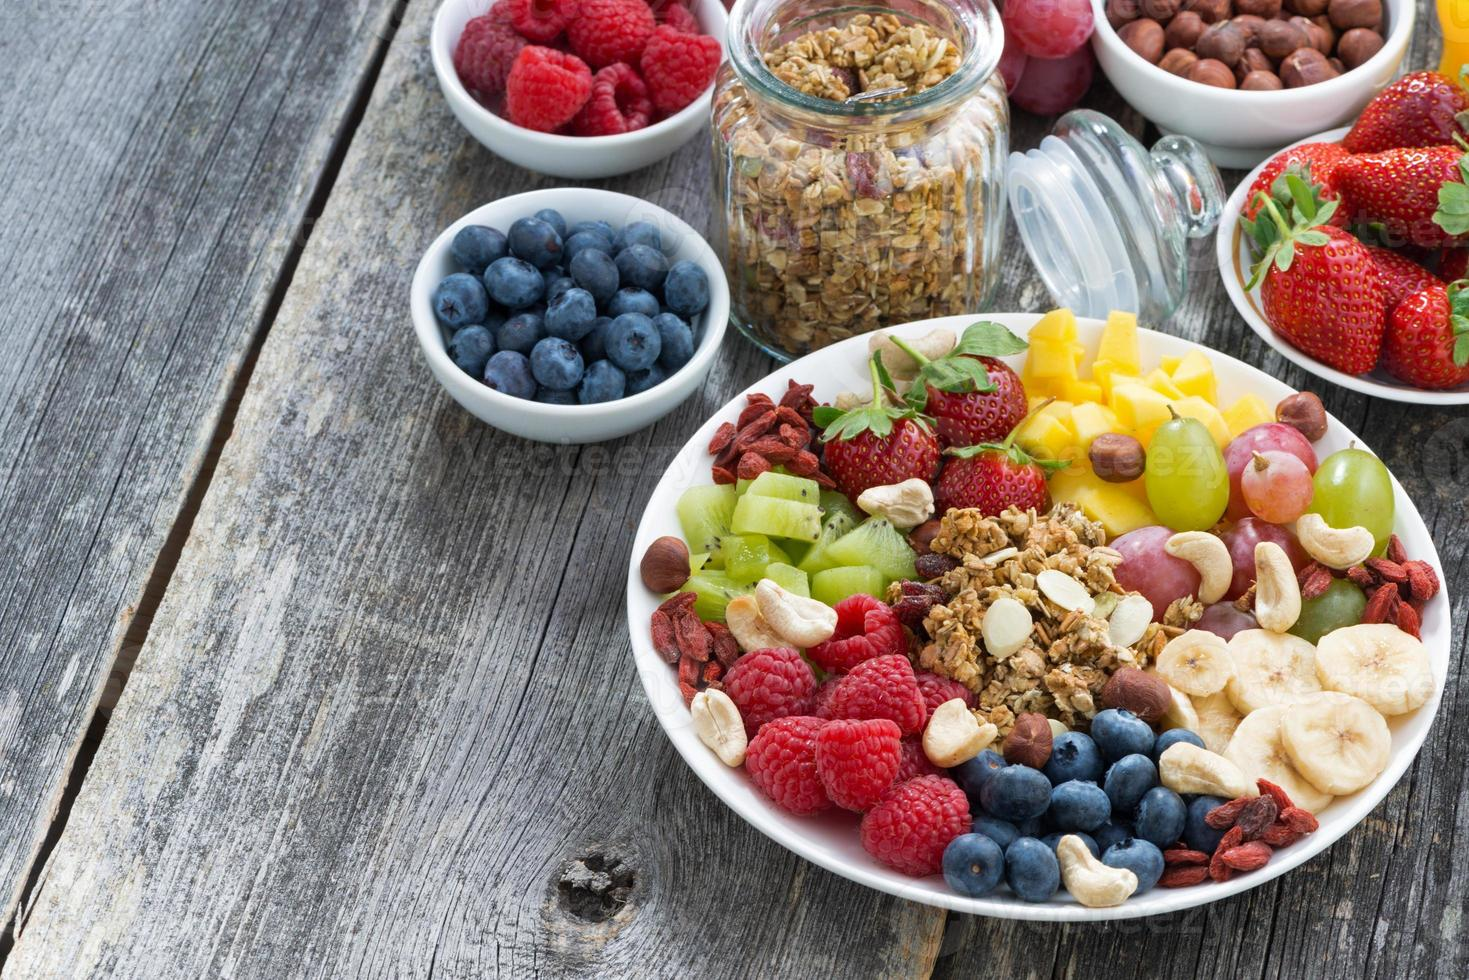 ingredienti per una sana colazione - frutti di bosco, frutta, muesli foto